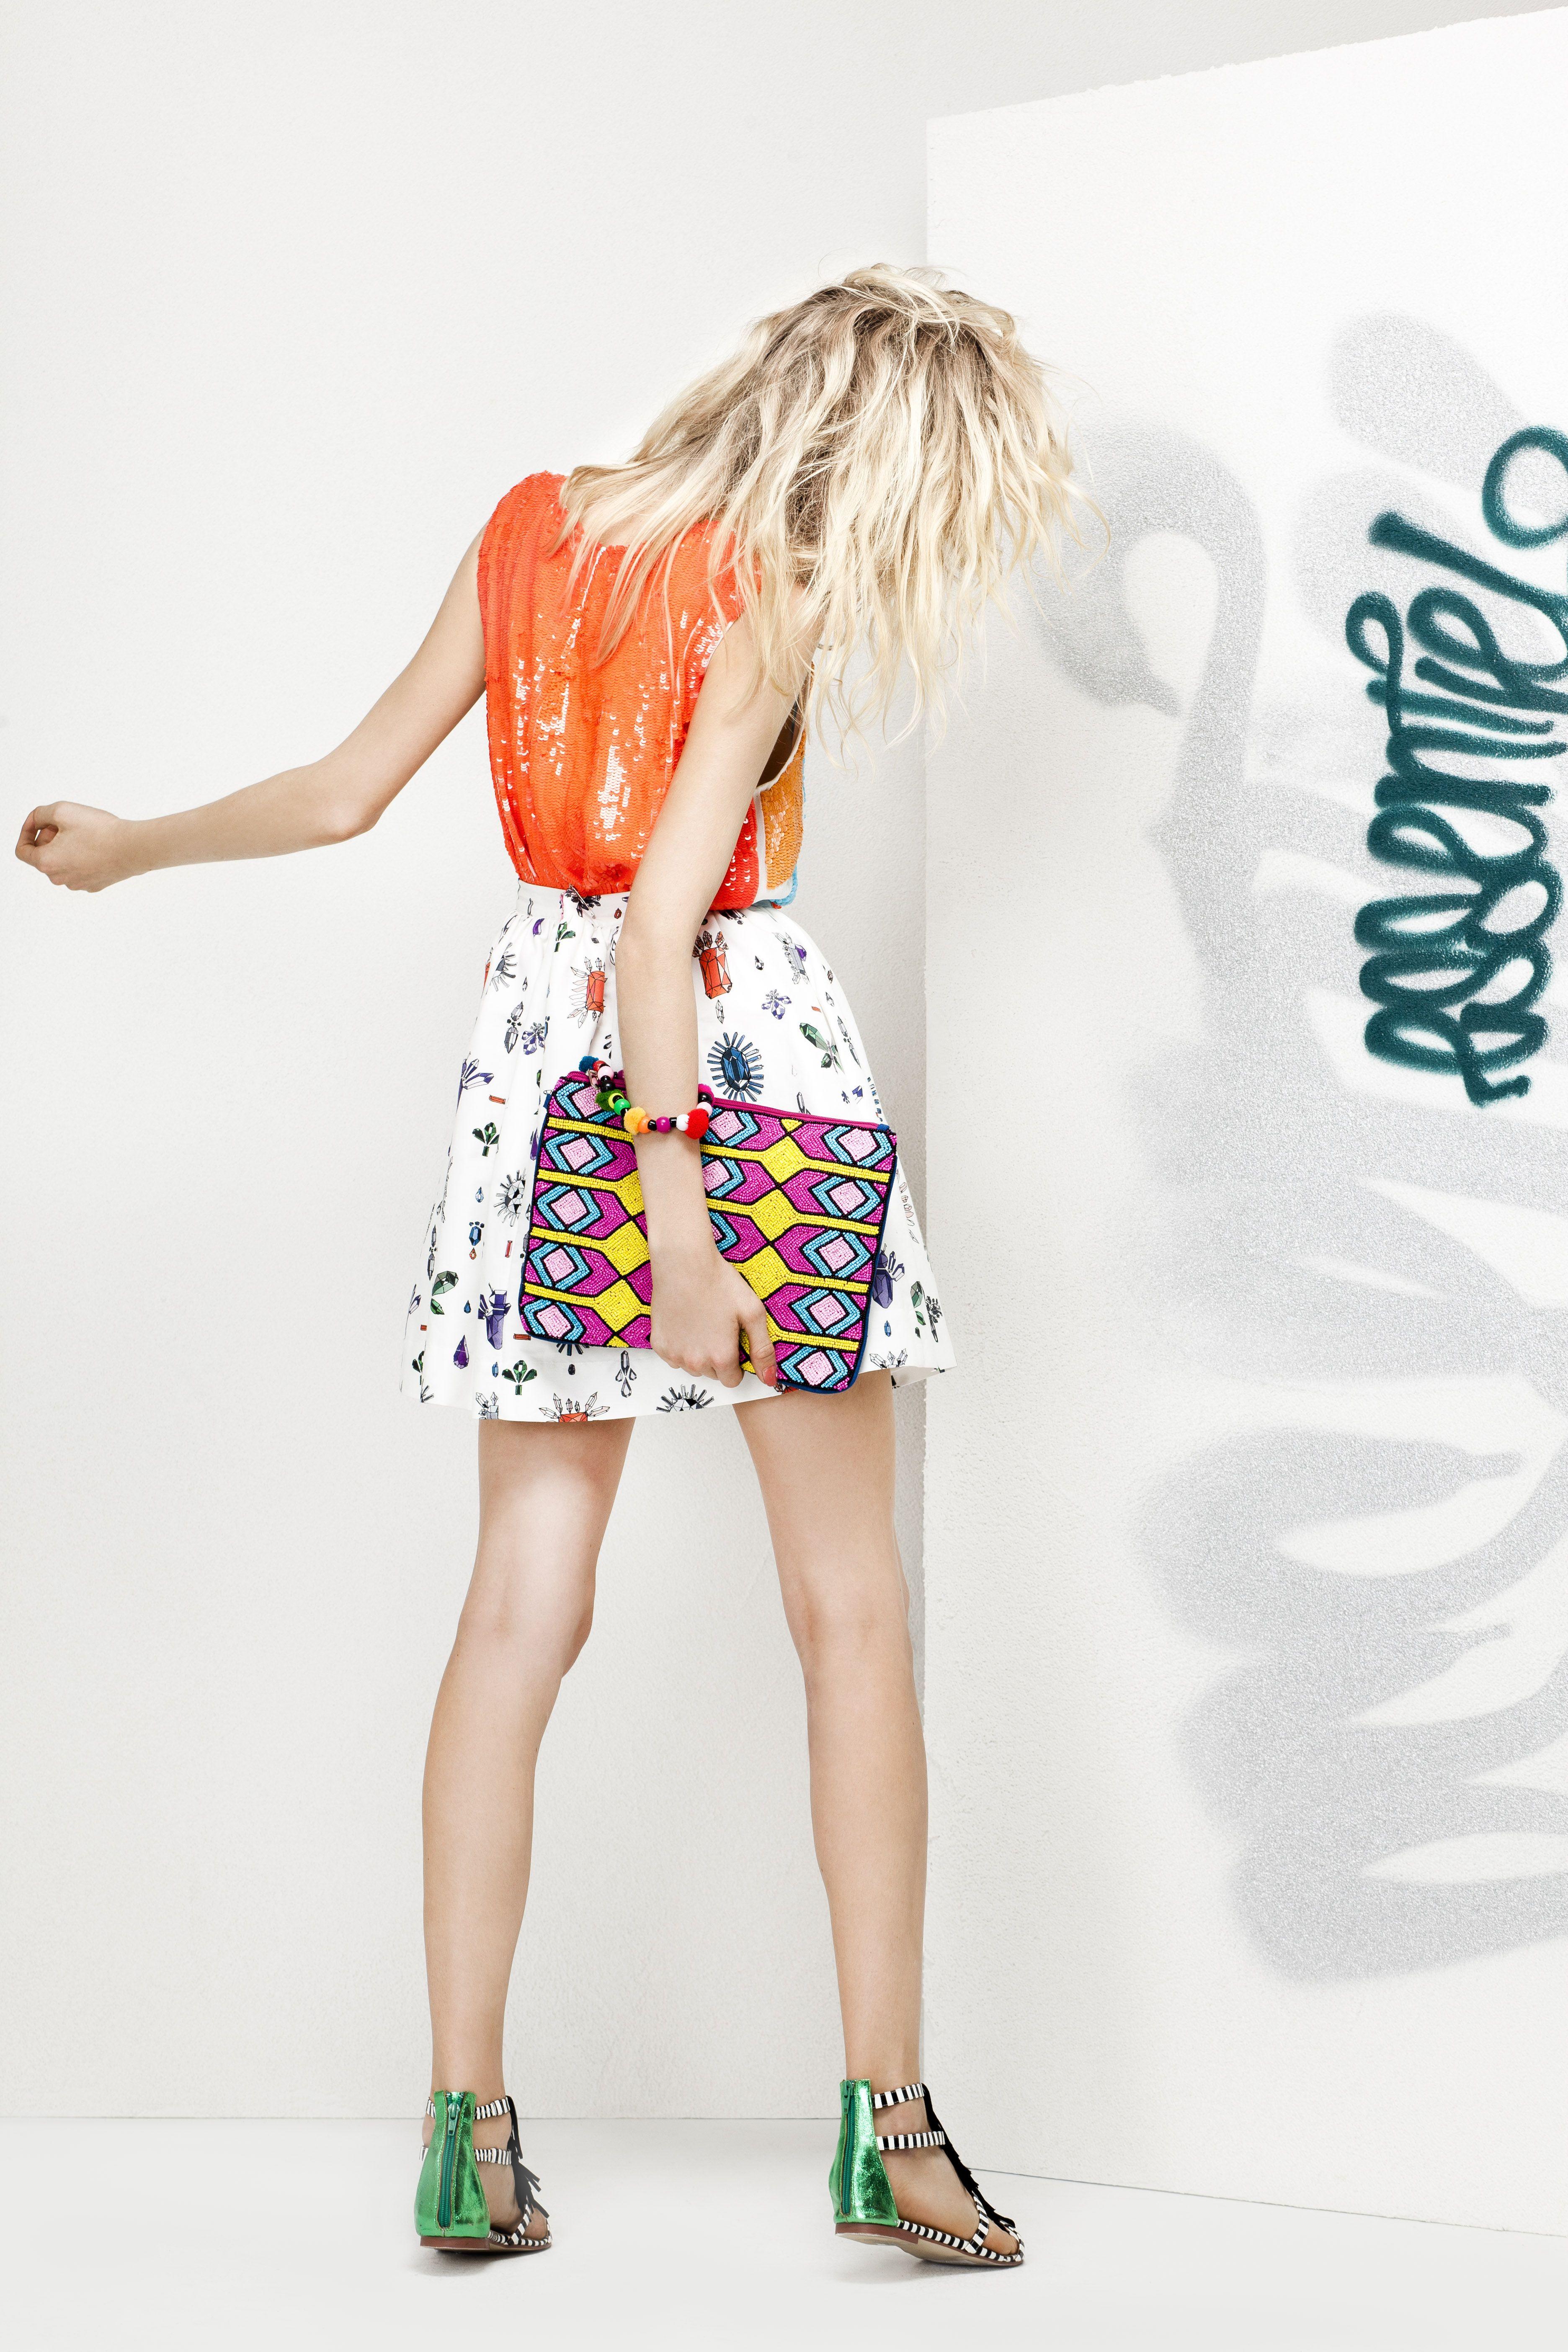 Anneleen Meurs -  Look 20 - Lookbook Women Spring Summer 2014 - Essentiel Antwerp #loveisessentiel